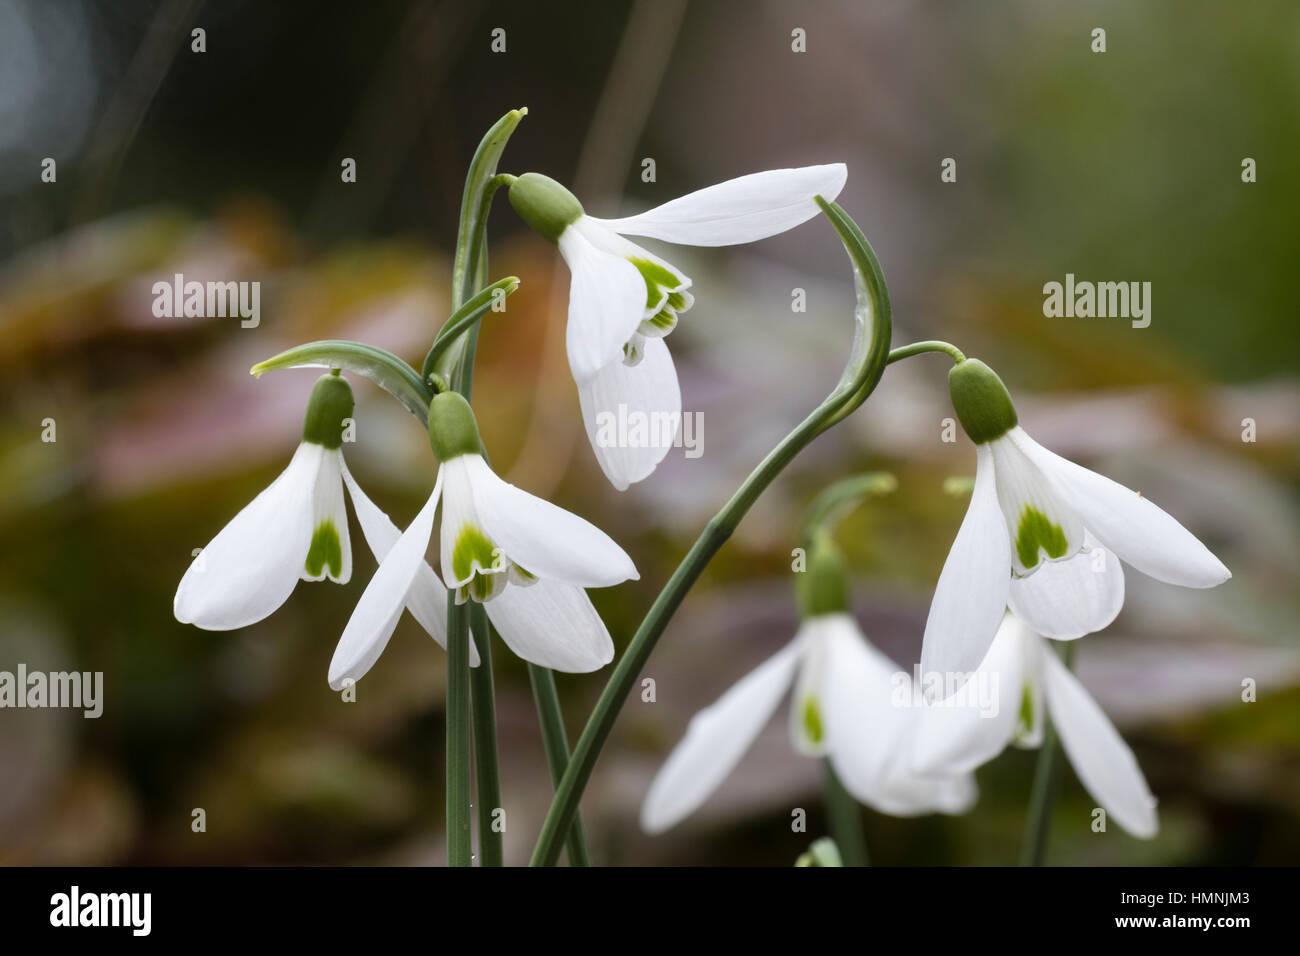 February flowers of the hybrid snowdrop, Galanthus x hybridus 'David Baker' - Stock Image